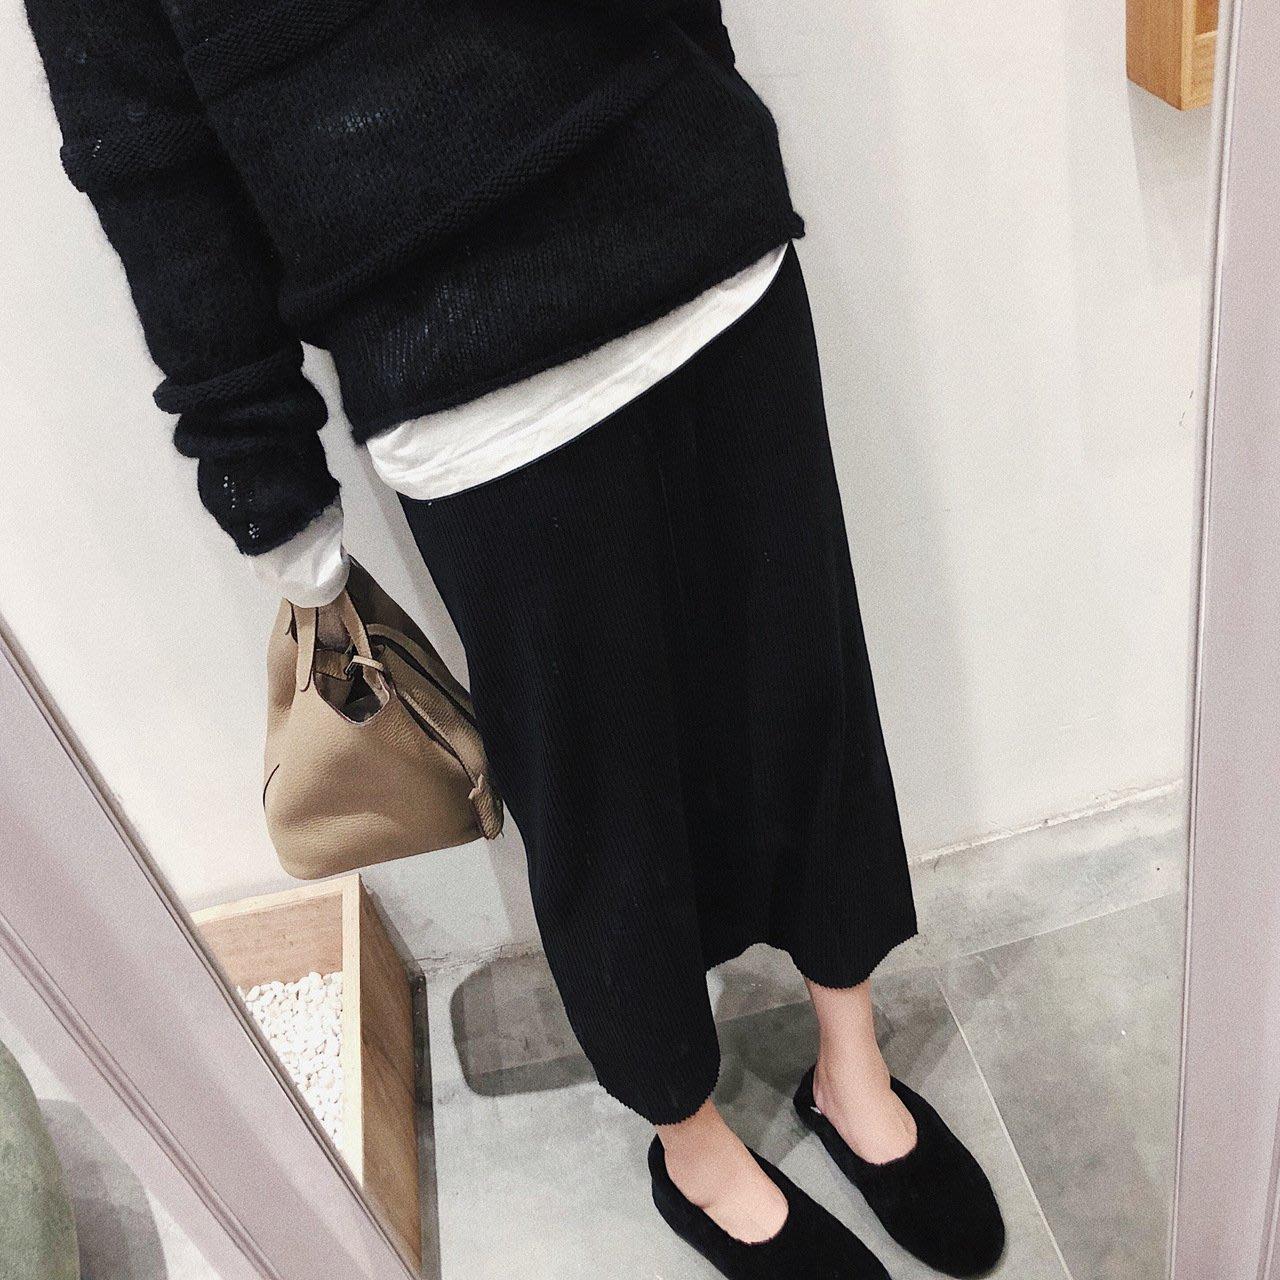 C Select Shop ♥ 好評返單款!設計款胯襠裙褲 加厚中長款半身裙 黑色 百搭顯瘦